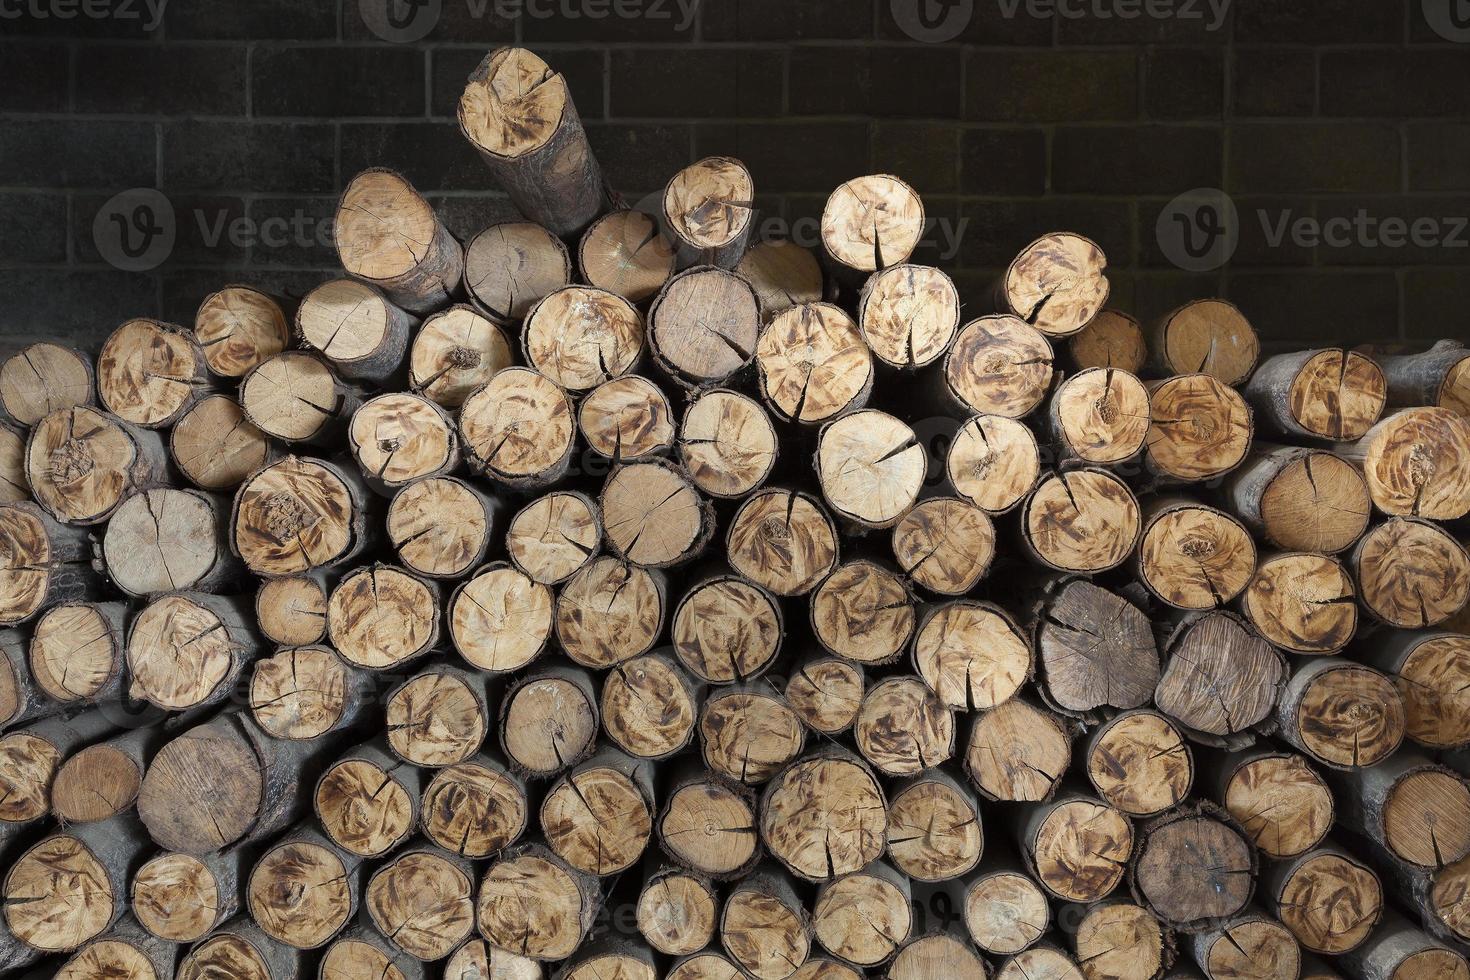 Holz im Kamin. foto